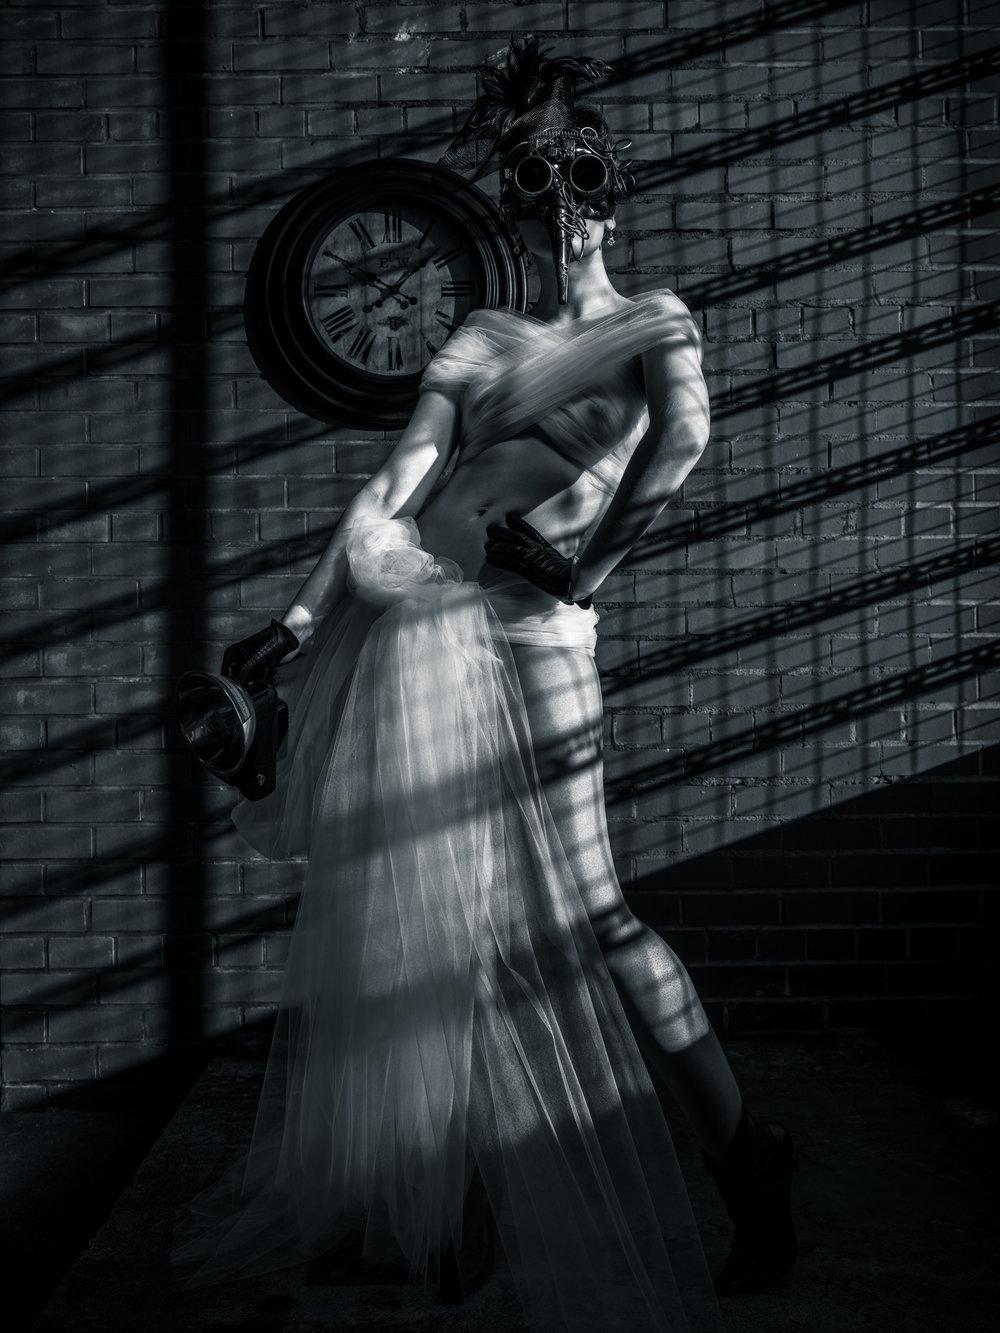 joyKidston_steampunk paradox-084-E-3.jpg